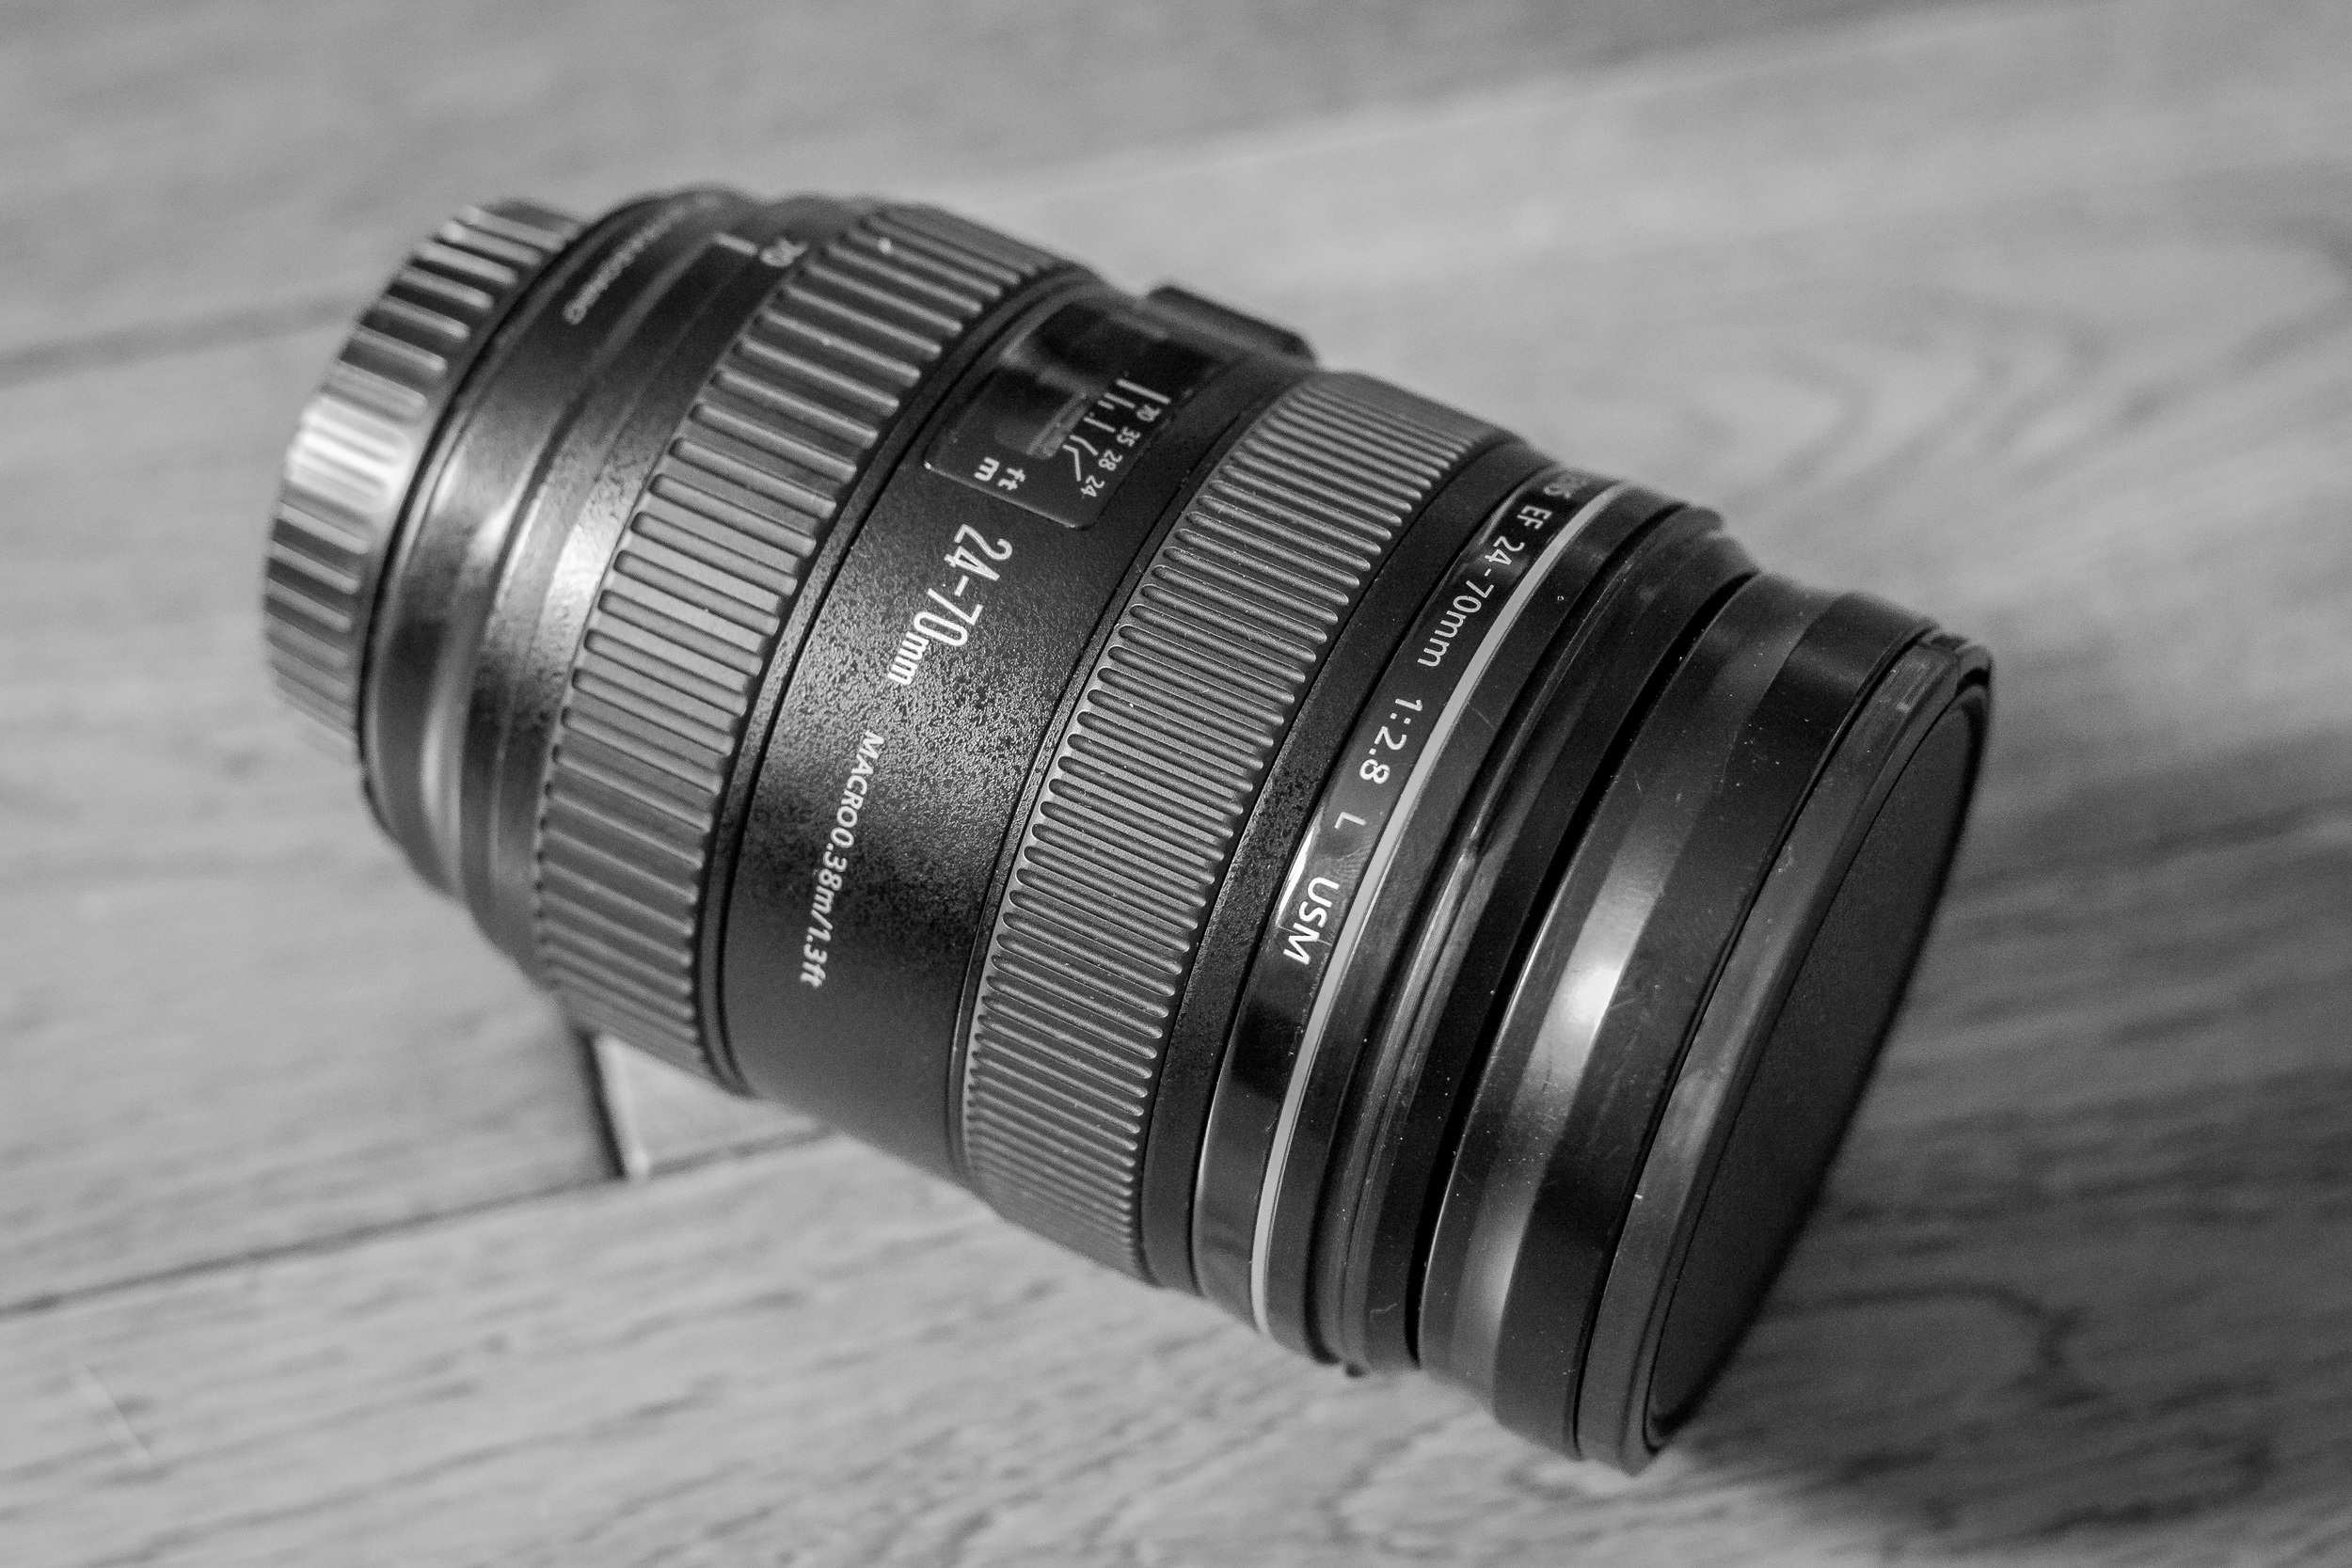 The versatile 24-70mm 2.8 lens is my workhorse.